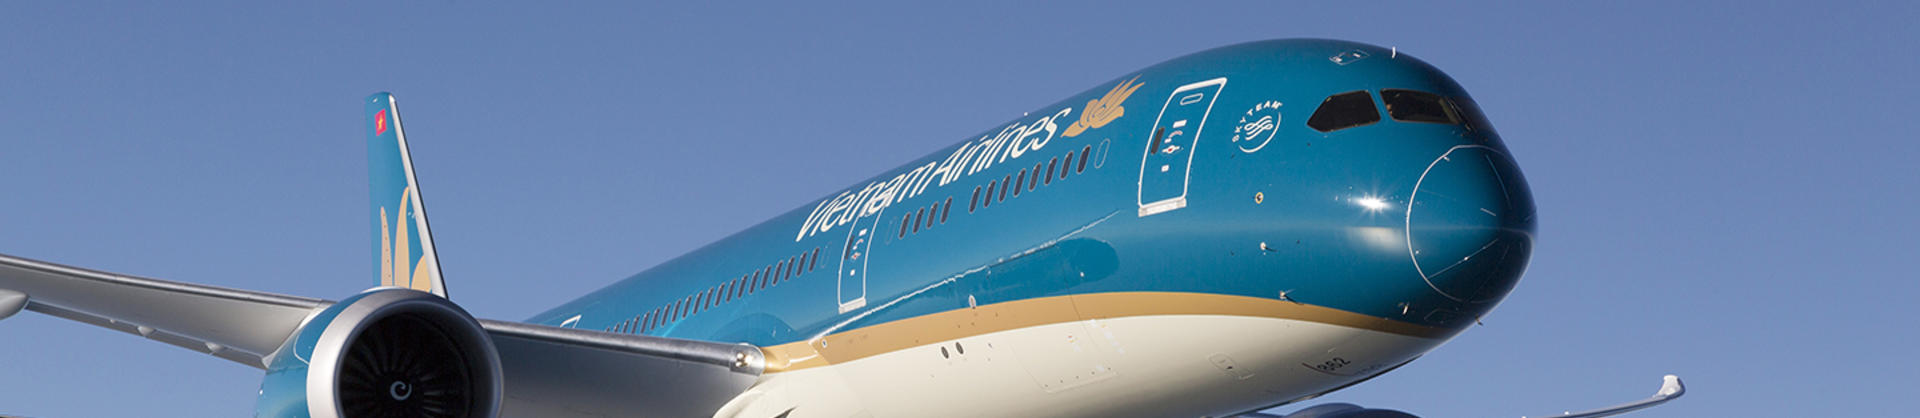 Vietnam Airlines B787